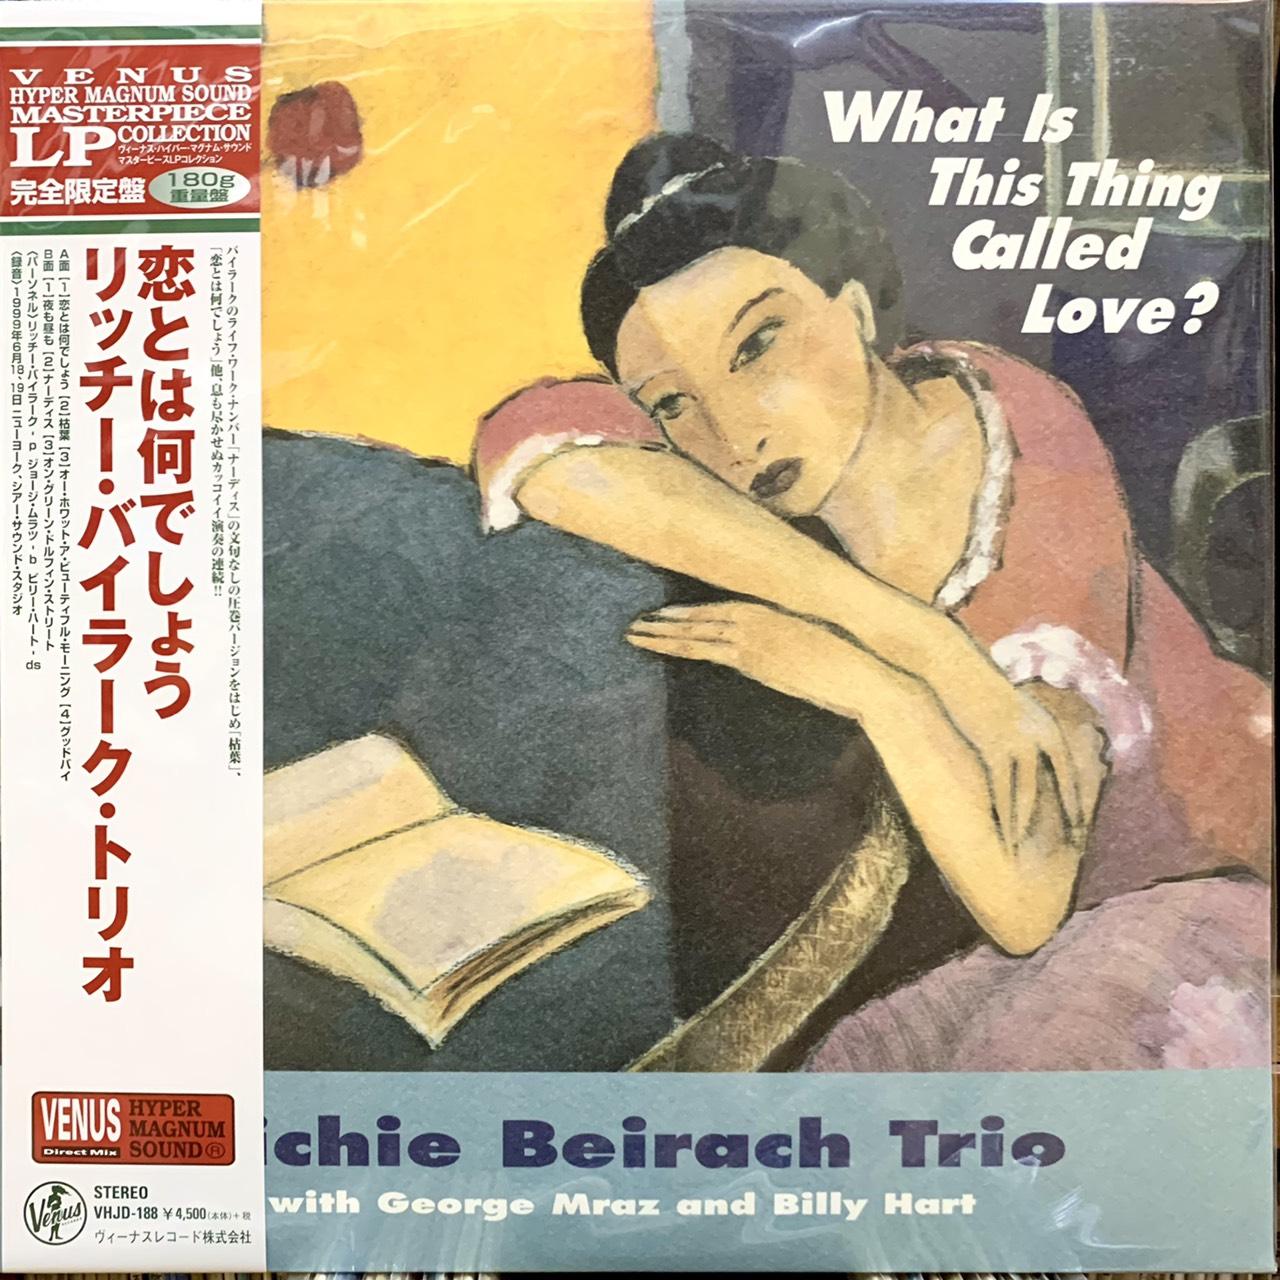 dia-than-vinyl-what-is-this-thing-called-love-richie-beirach-trio